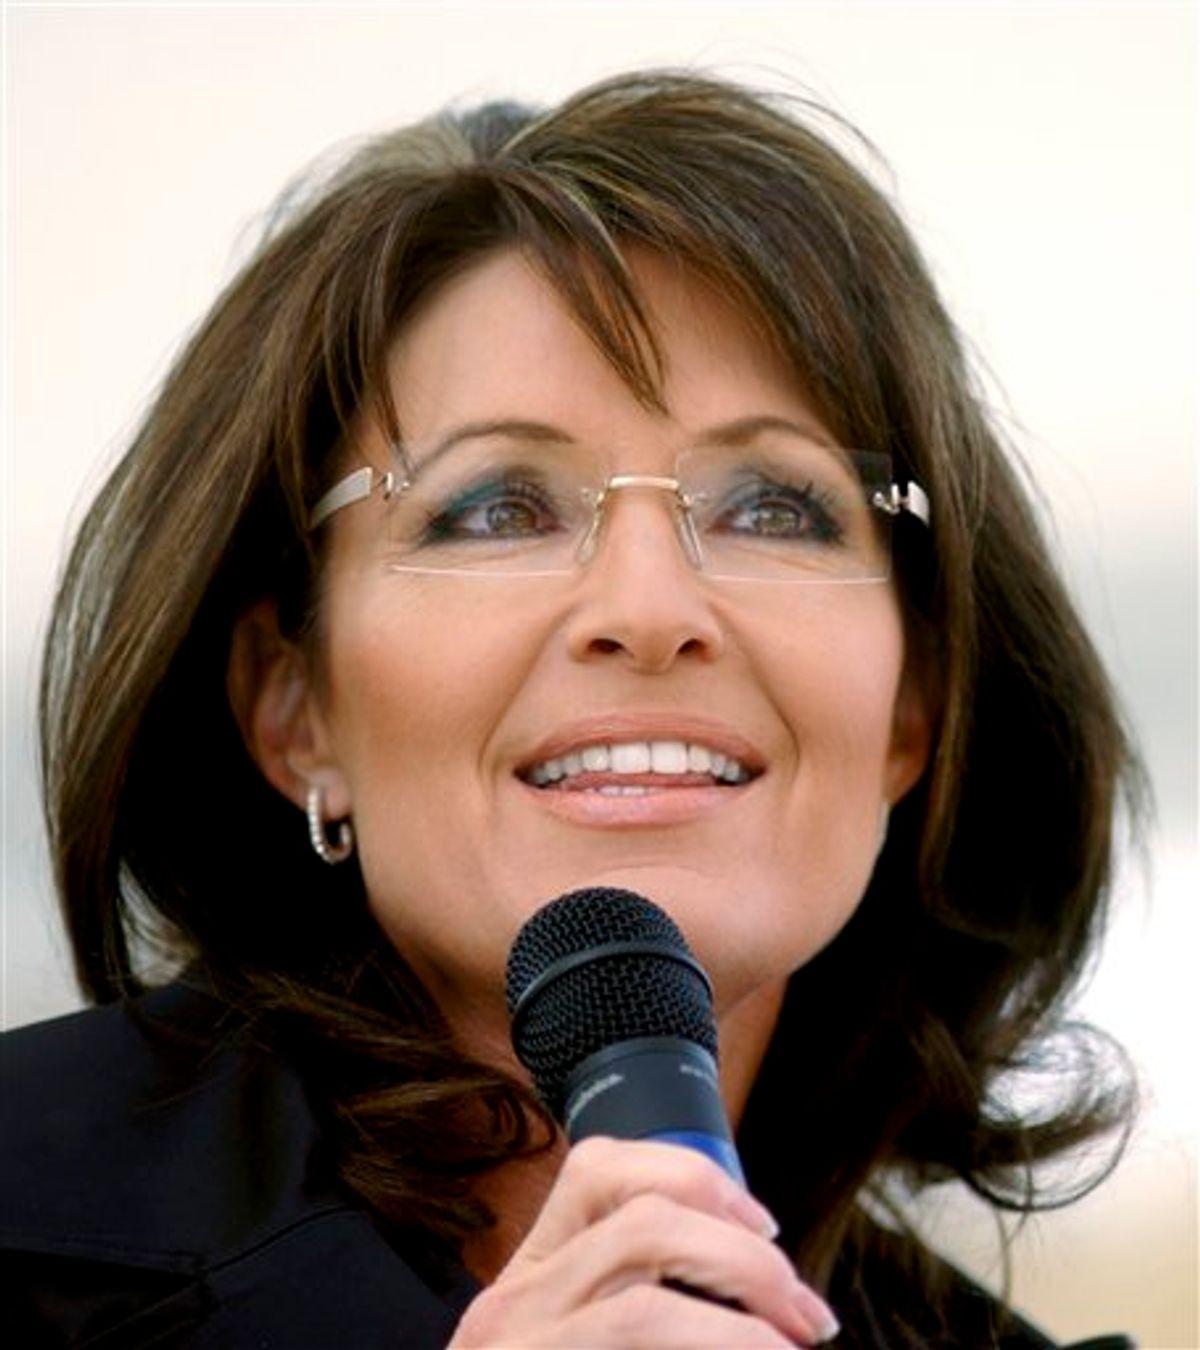 FILE - In this Oct. 30, 2010 file photo, former Alaska Gov. Sarah Palin stumps for Republican candidate for Senate, John Raese, during a rally at Haddad Riverfront Park in Charleston, W.Va. (AP Photo/Jon C. Hancock, file) (AP)